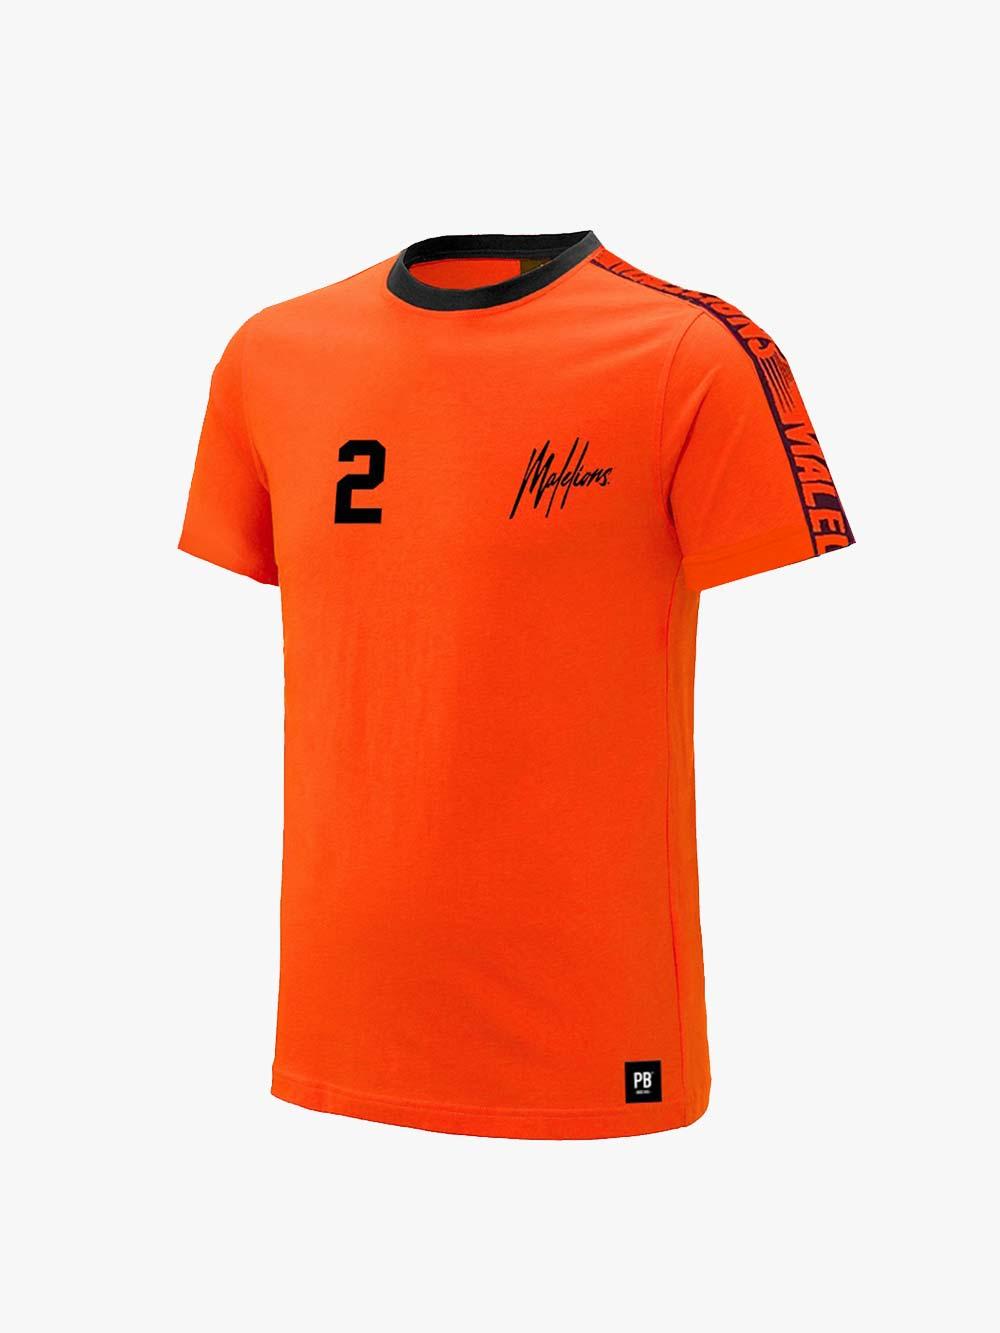 Malelions-2-Knarsdorp-EK2021-shirt-front